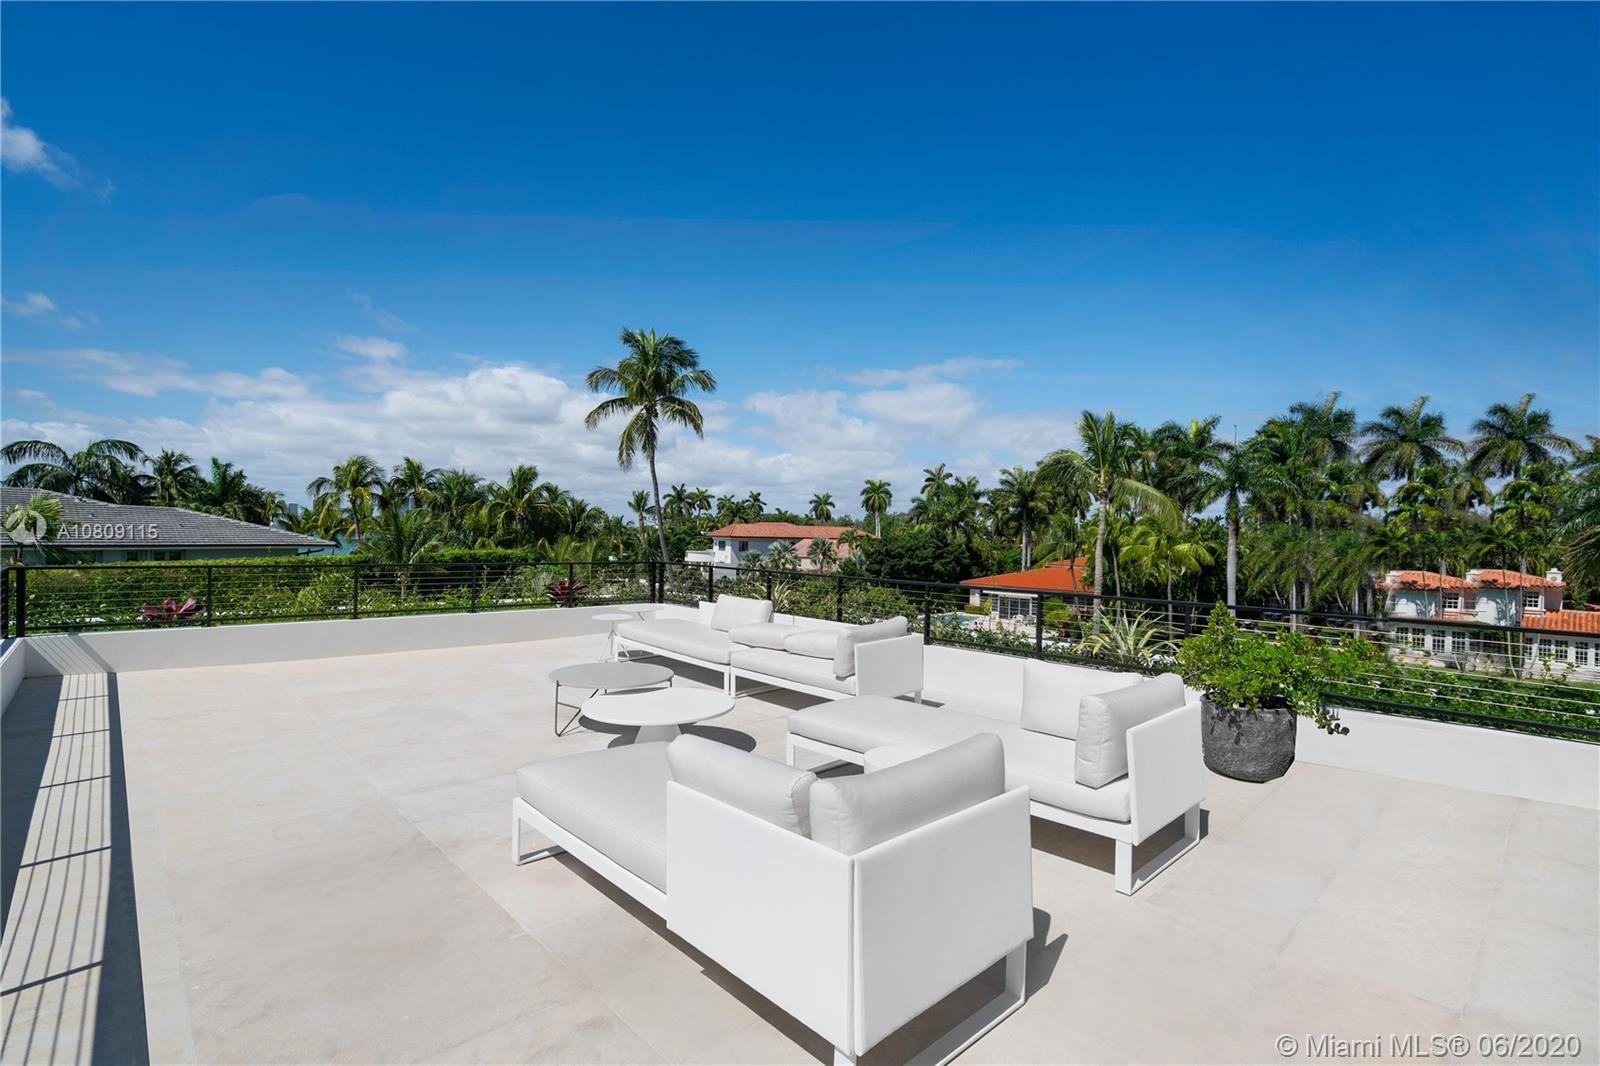 Photo 33 of Listing MLS a10809115 in 1635 W 22nd St Miami Beach FL 33140